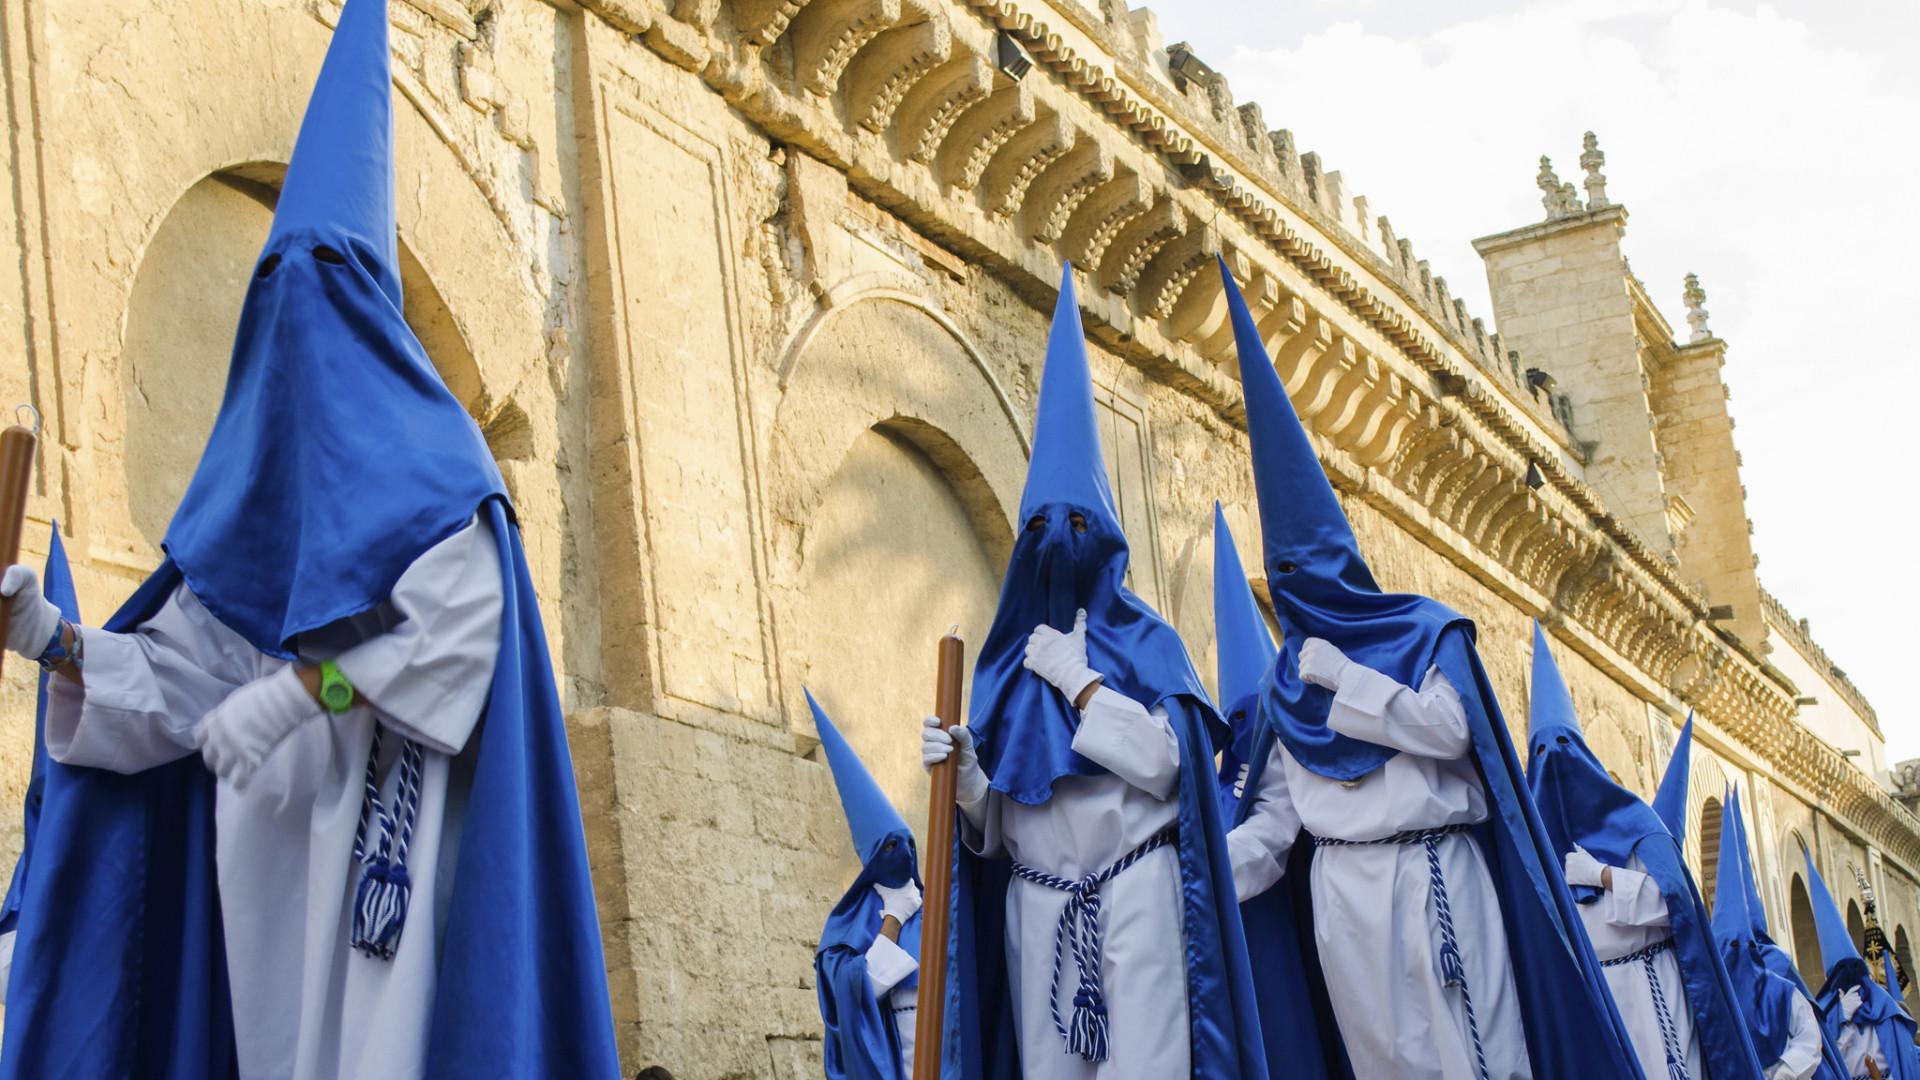 Breve historia de la Semana Santa